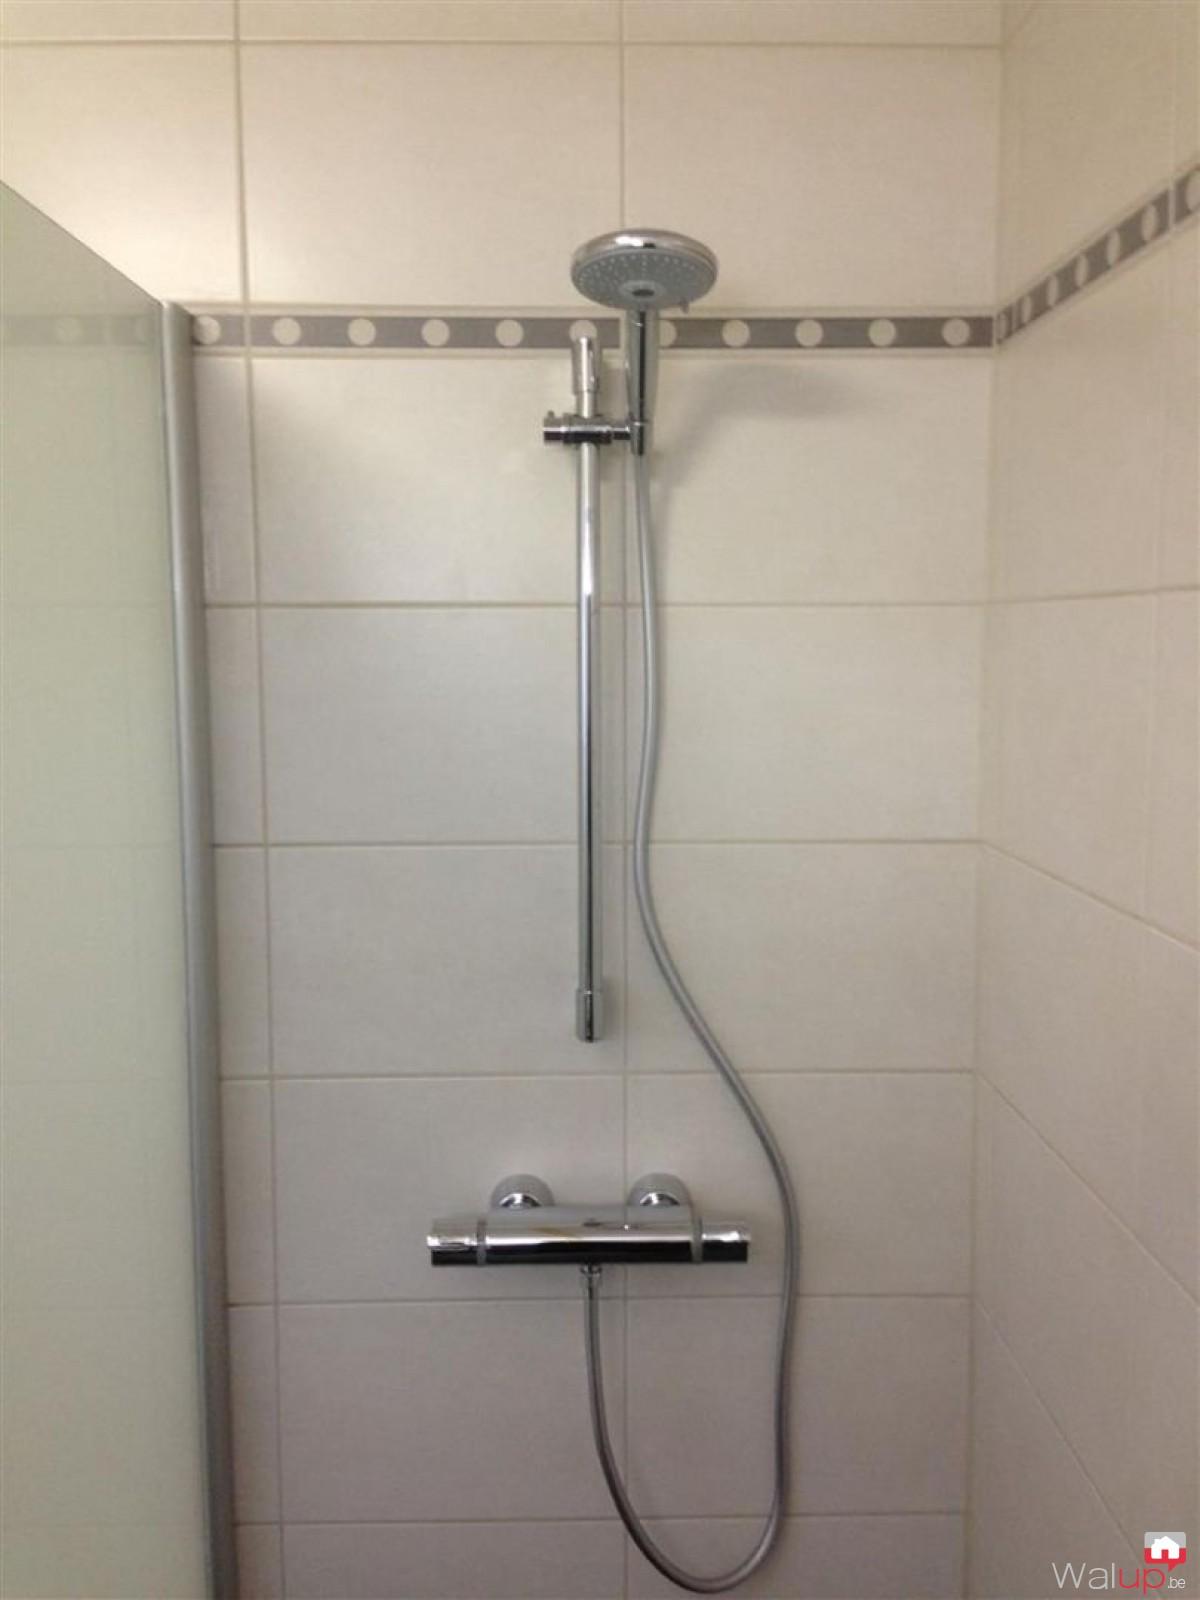 cout refection salle de bain cout refection salle de bain photos de conception de cout. Black Bedroom Furniture Sets. Home Design Ideas